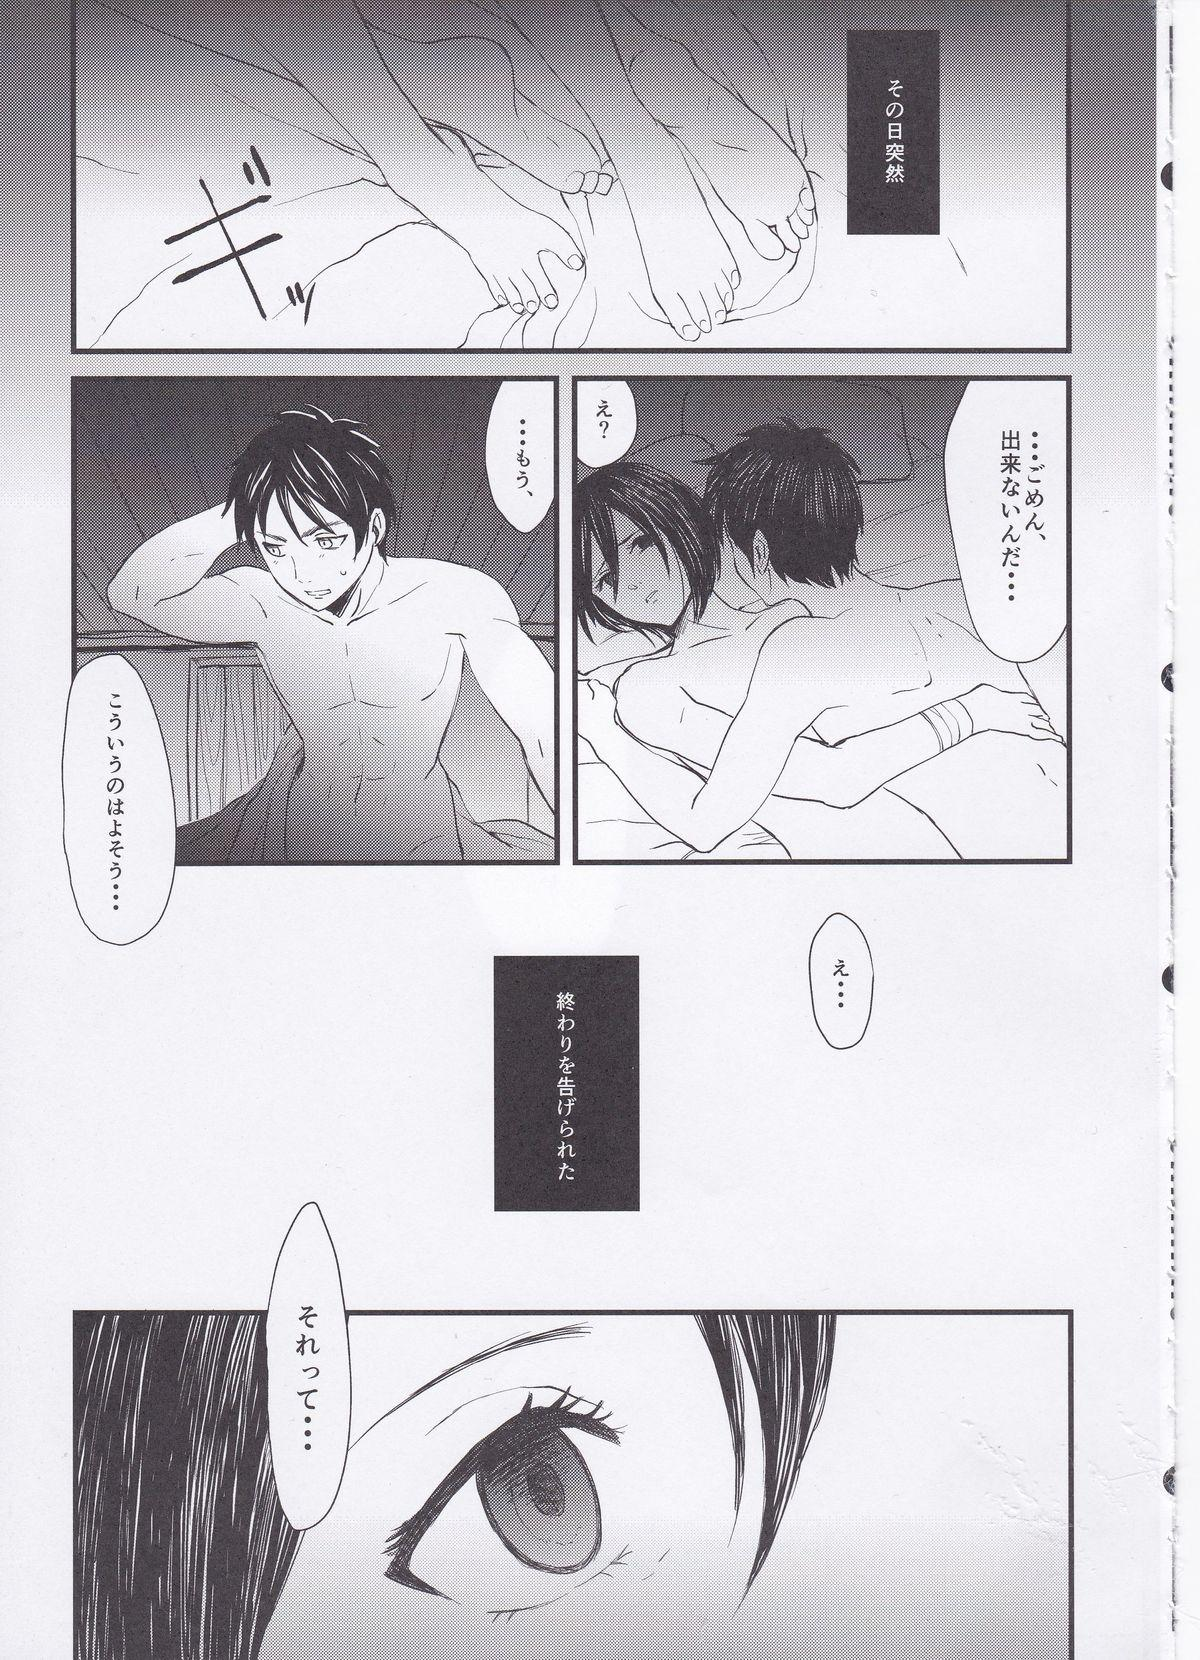 Ai no Romance Zenpen 6